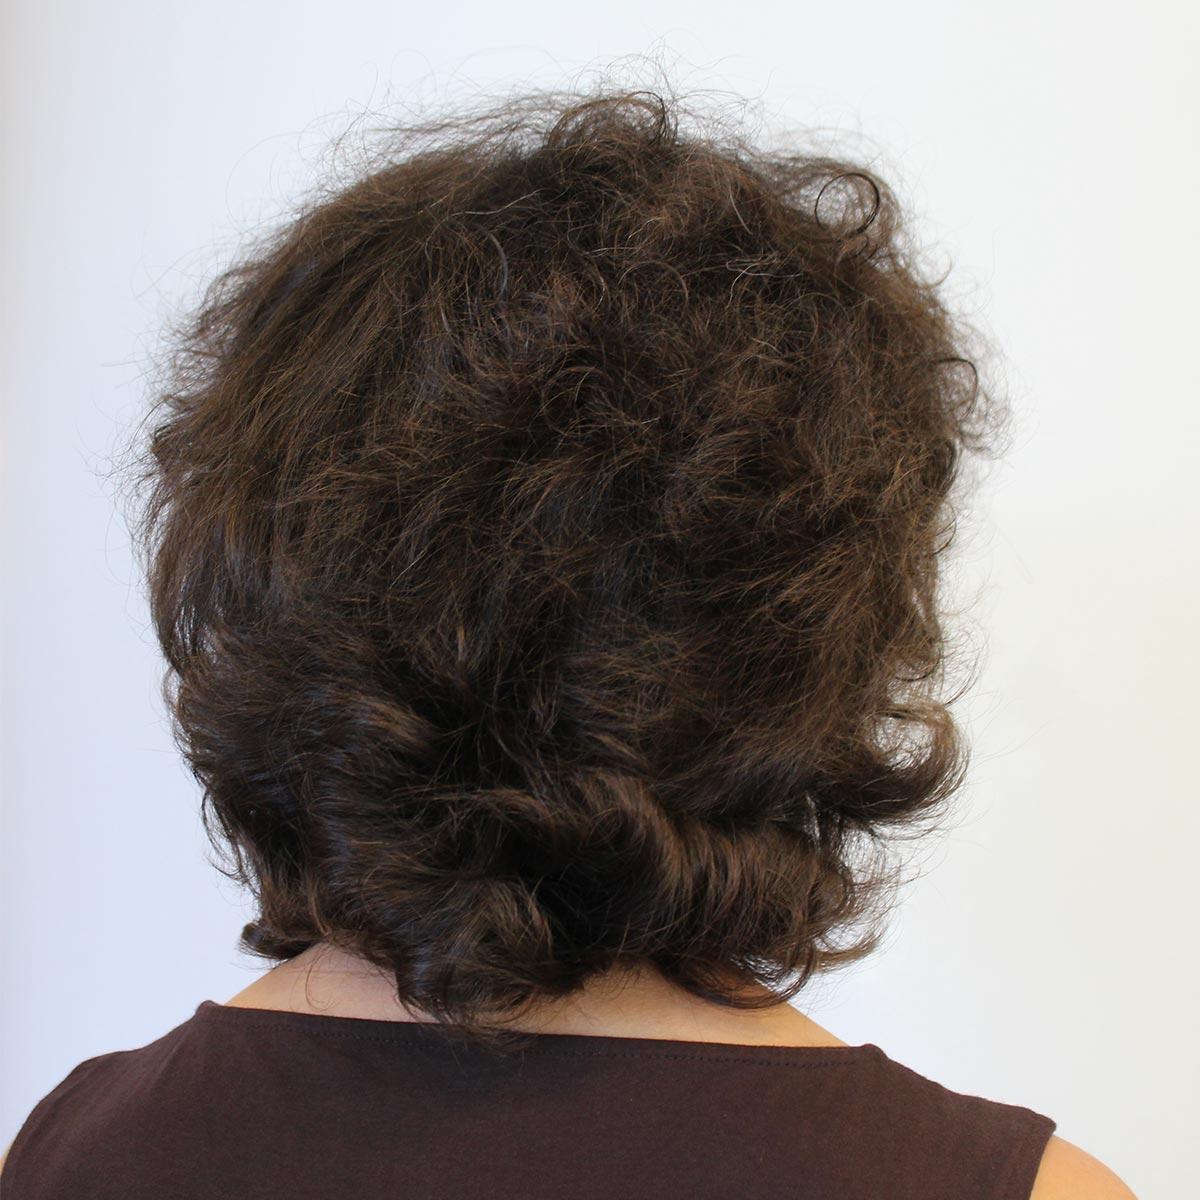 Haarverlängerung Kundin 1 vorher